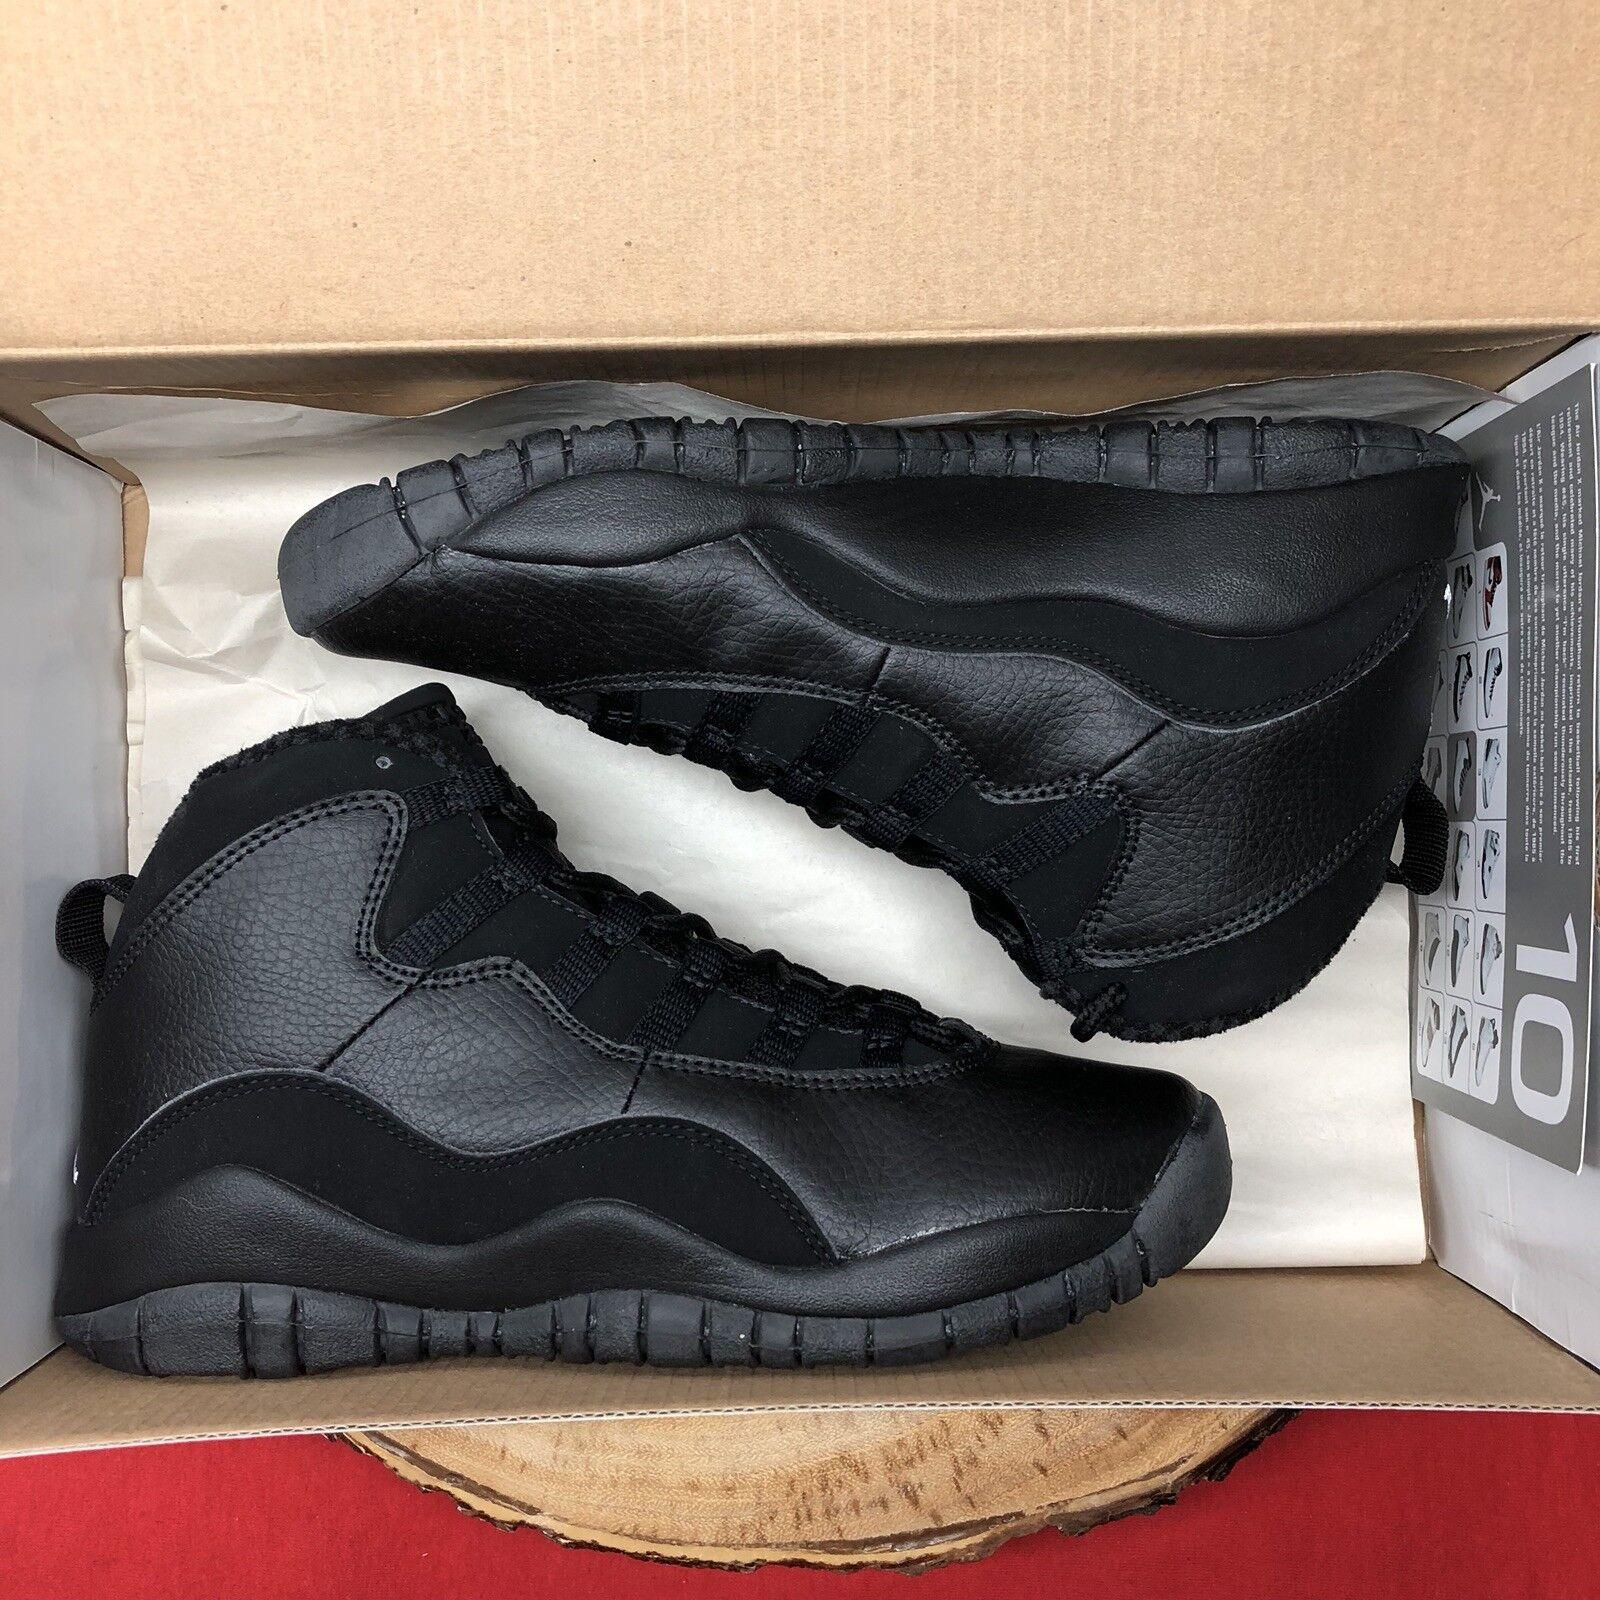 Nike air jordan retro - x größe - schwarz cat 310806 010 größe x 5y stealth - keks - xi 719344